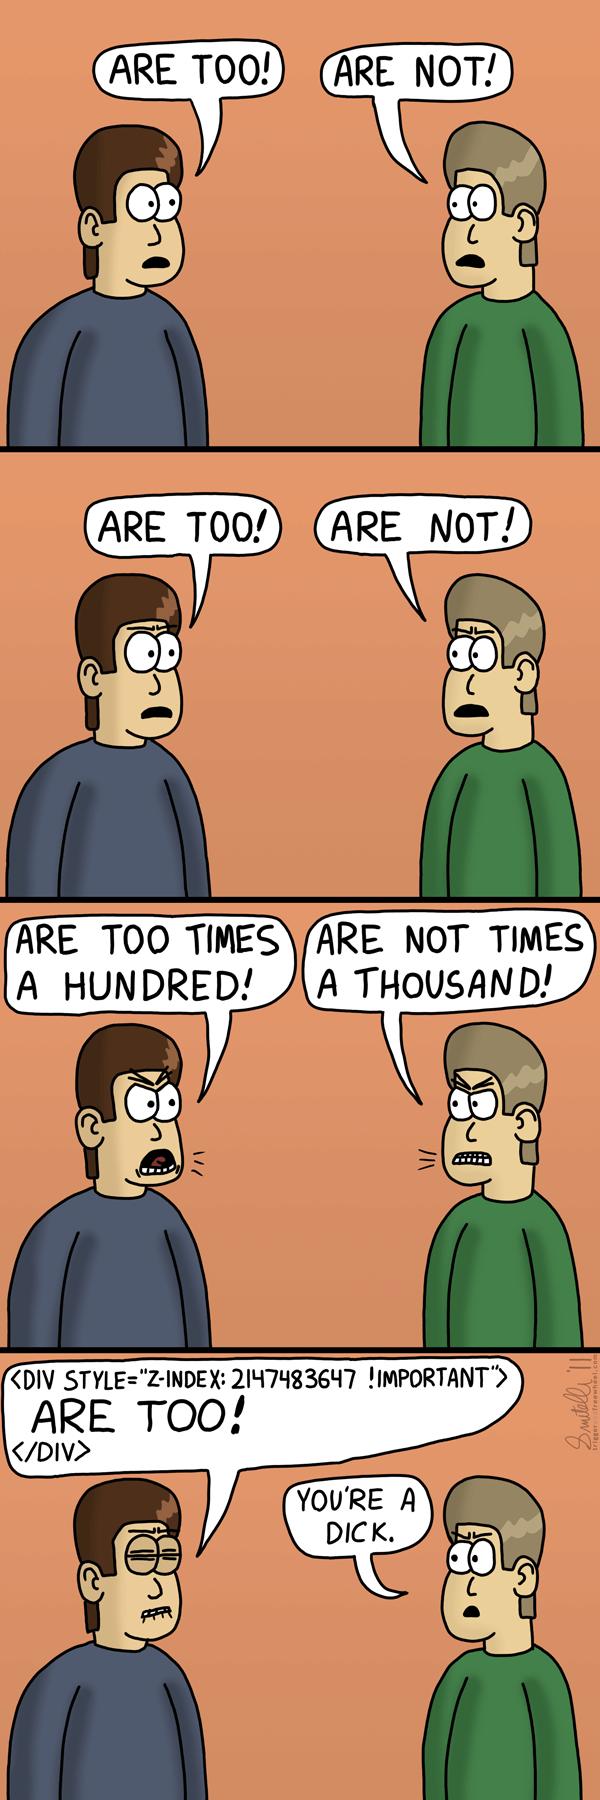 Childish Argument